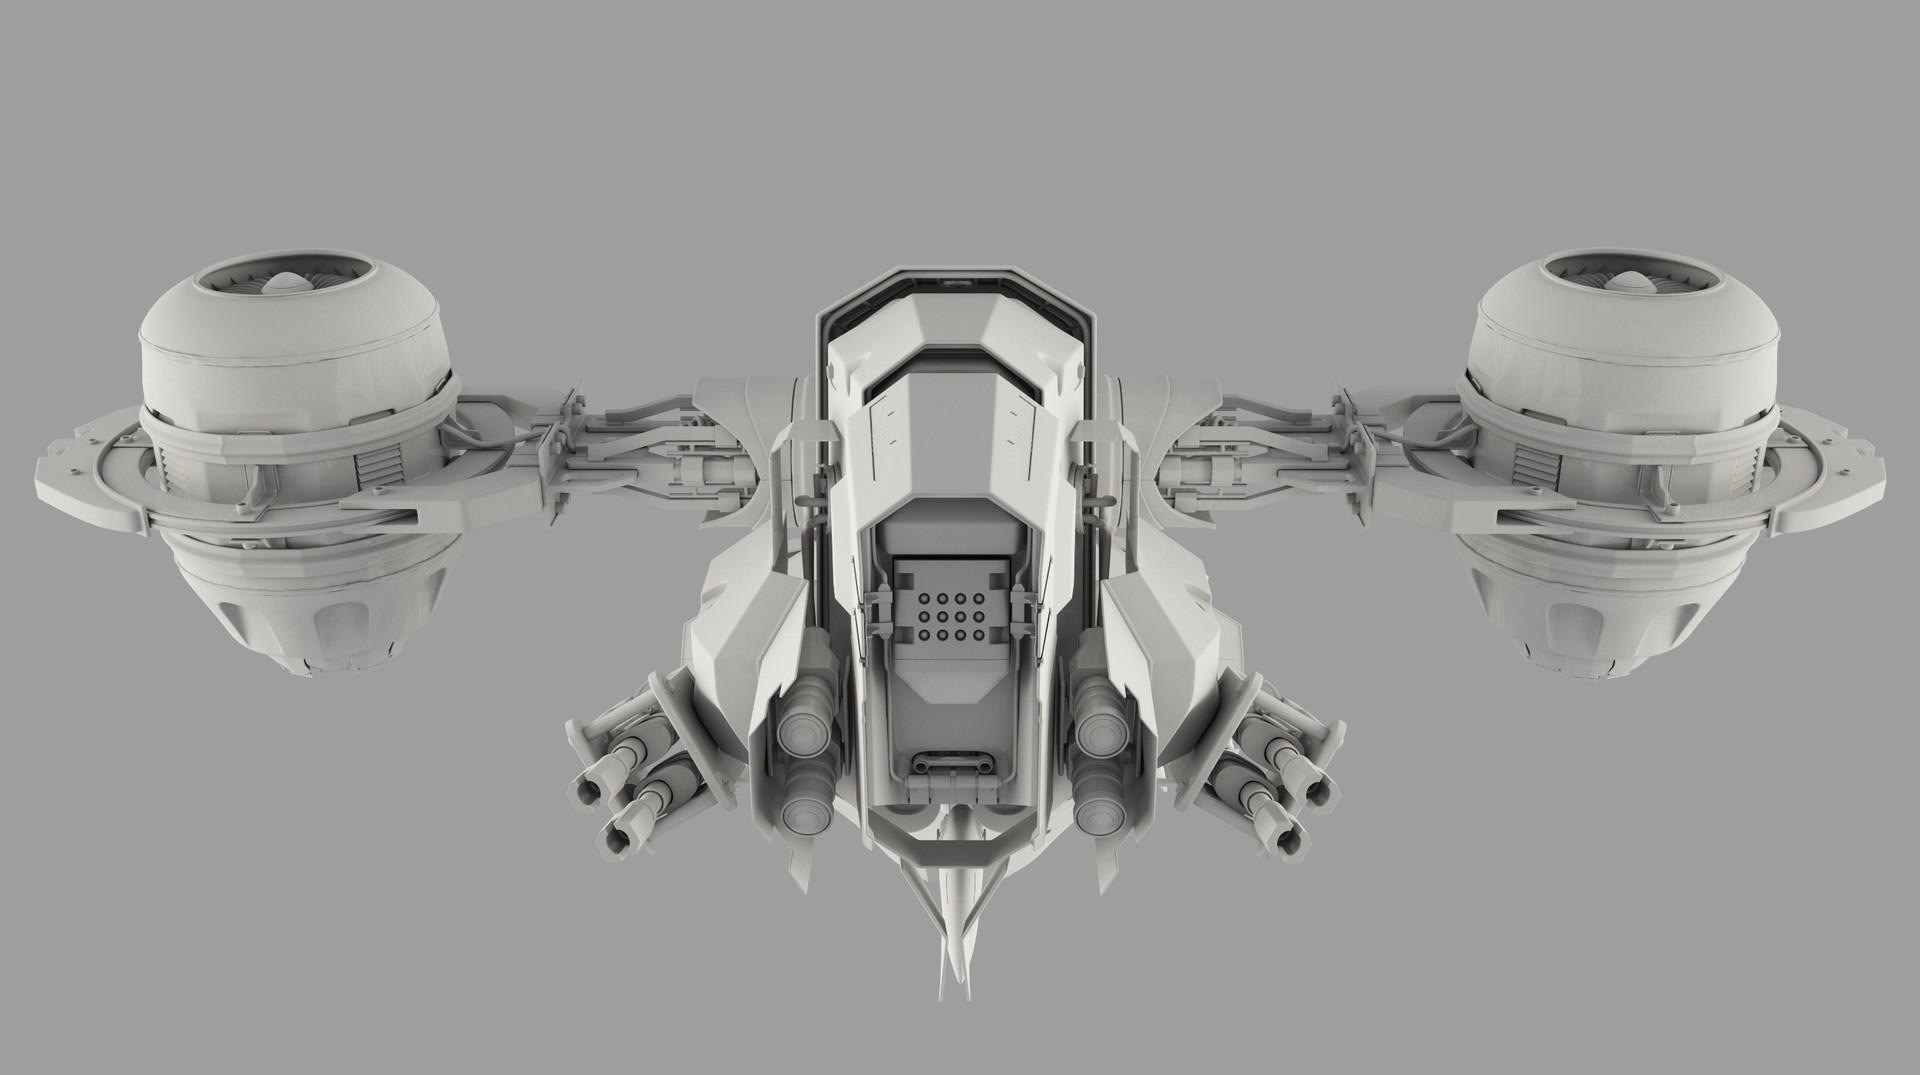 Tamas gyerman dronefrontclay0090